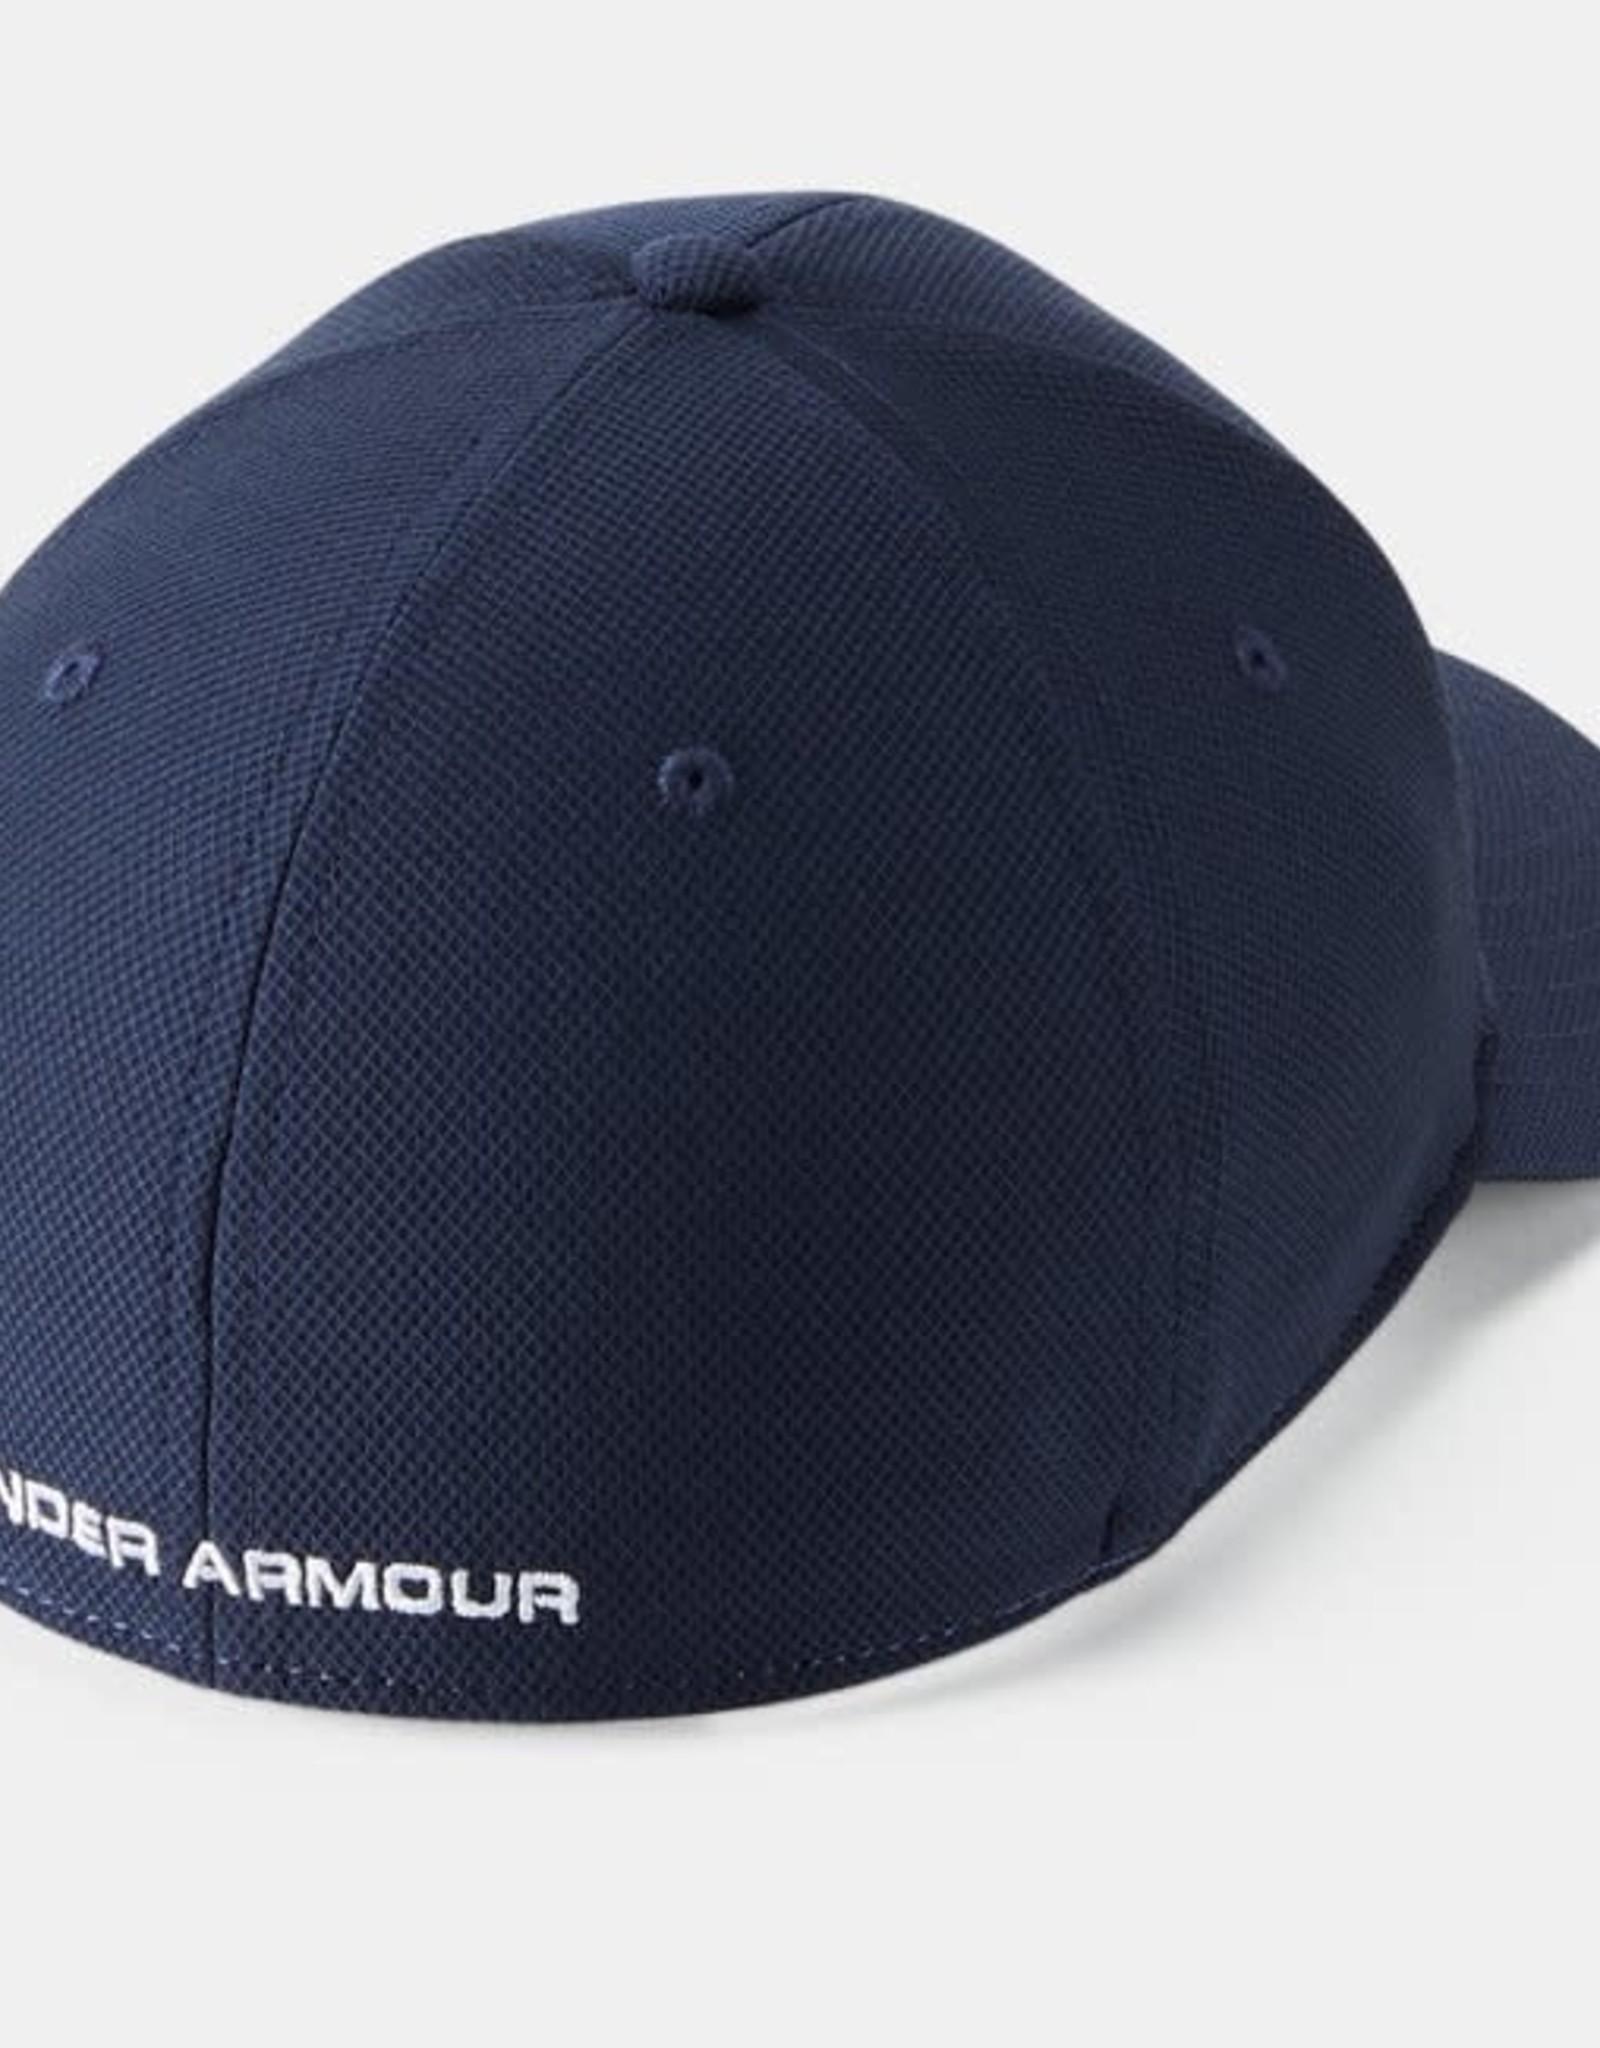 Under Armour Blitzing 3.0 Cap - navy blue